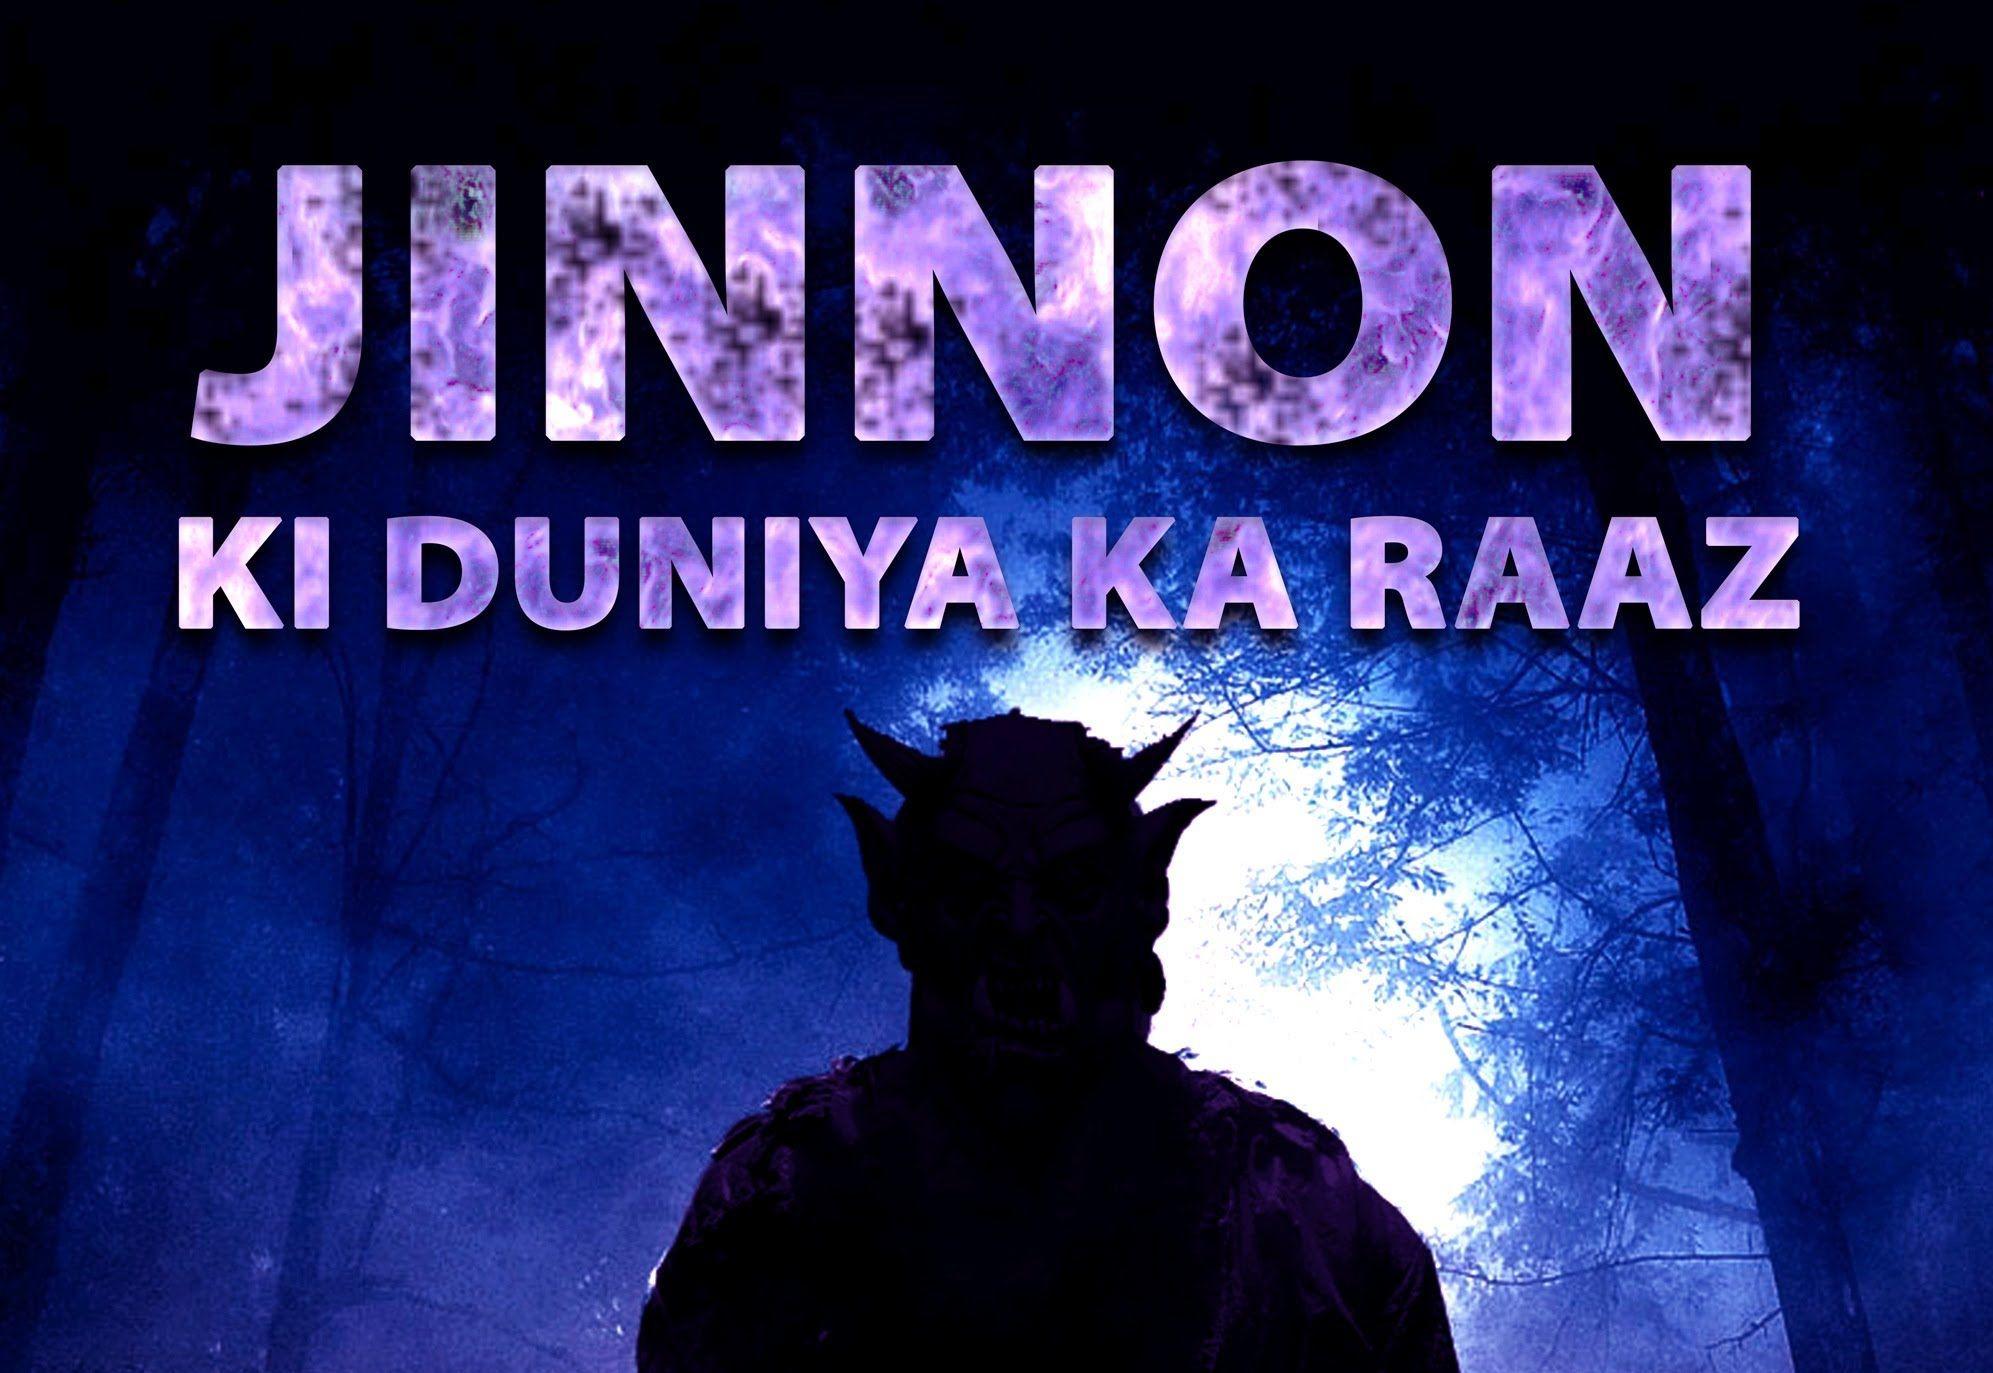 Jinn jinnat ki duniya ka raaz urdu with images